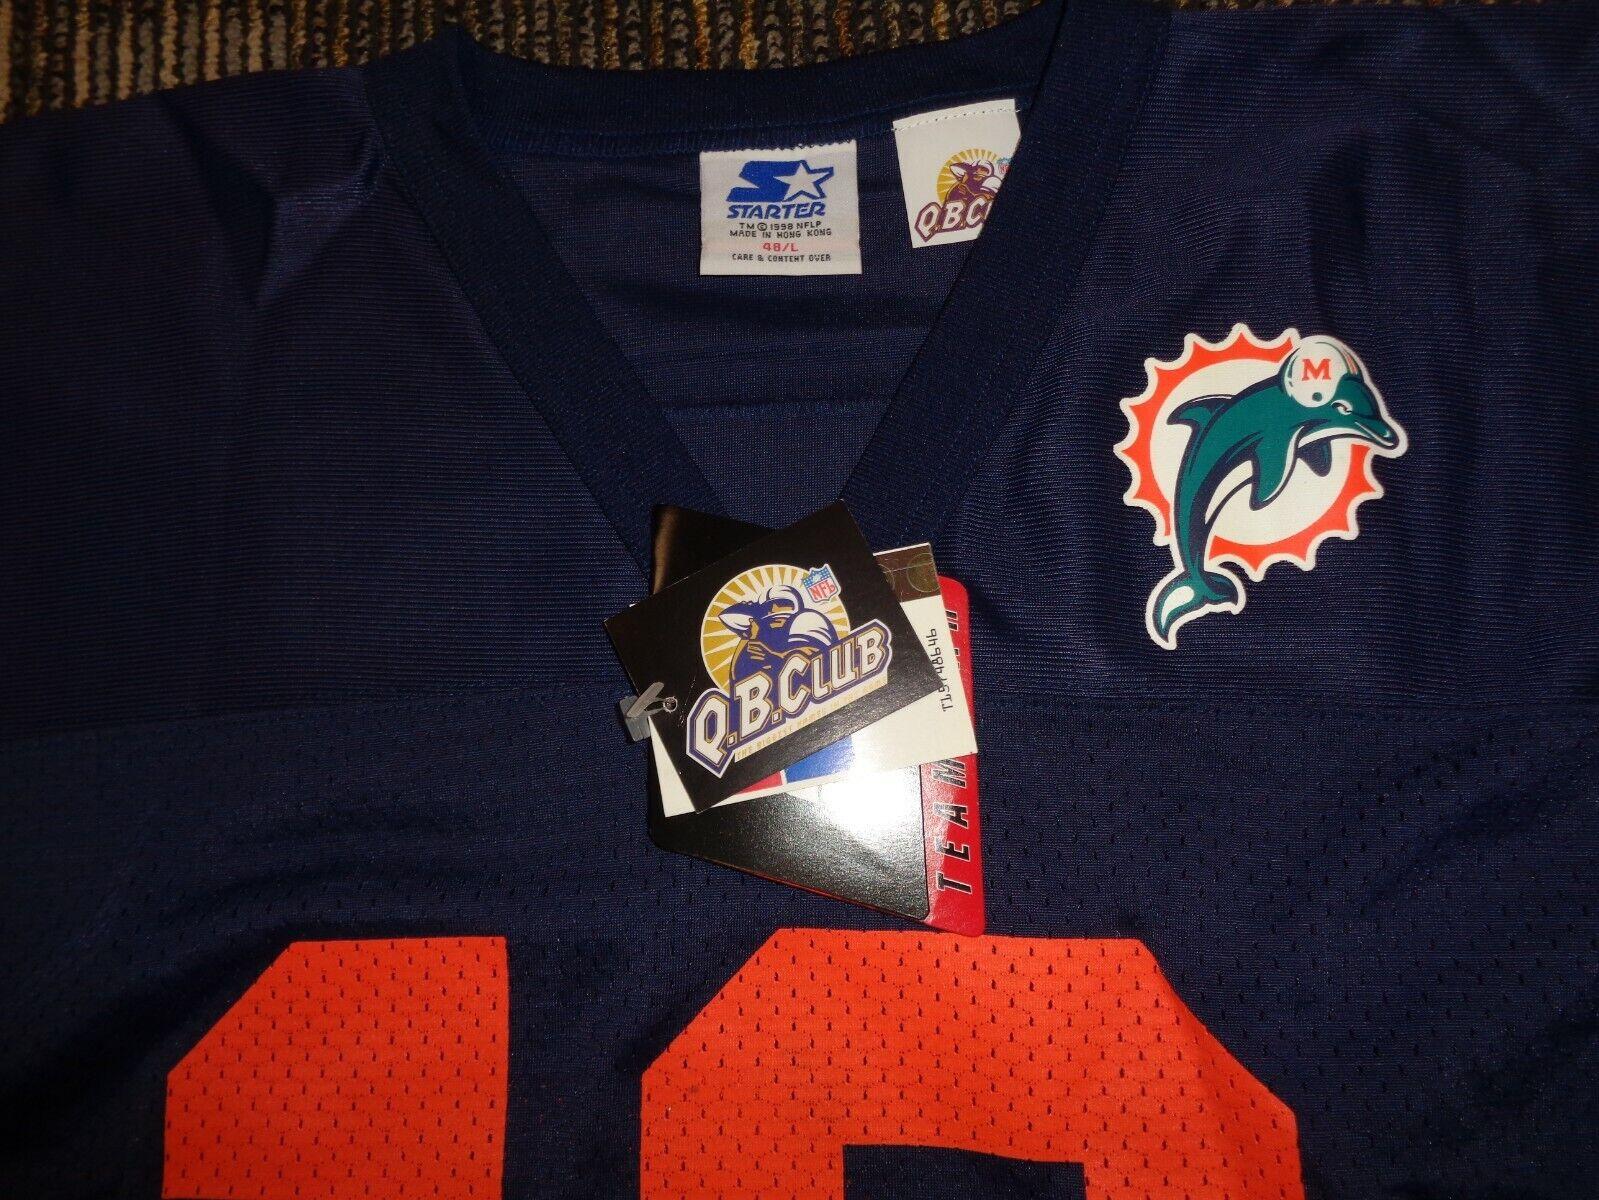 NWT DAN MARINO 13 MIAMI DOLPHINS STARTER BLUE MENS NFL GAME FOOTBALL JERSEY LG - $59.99